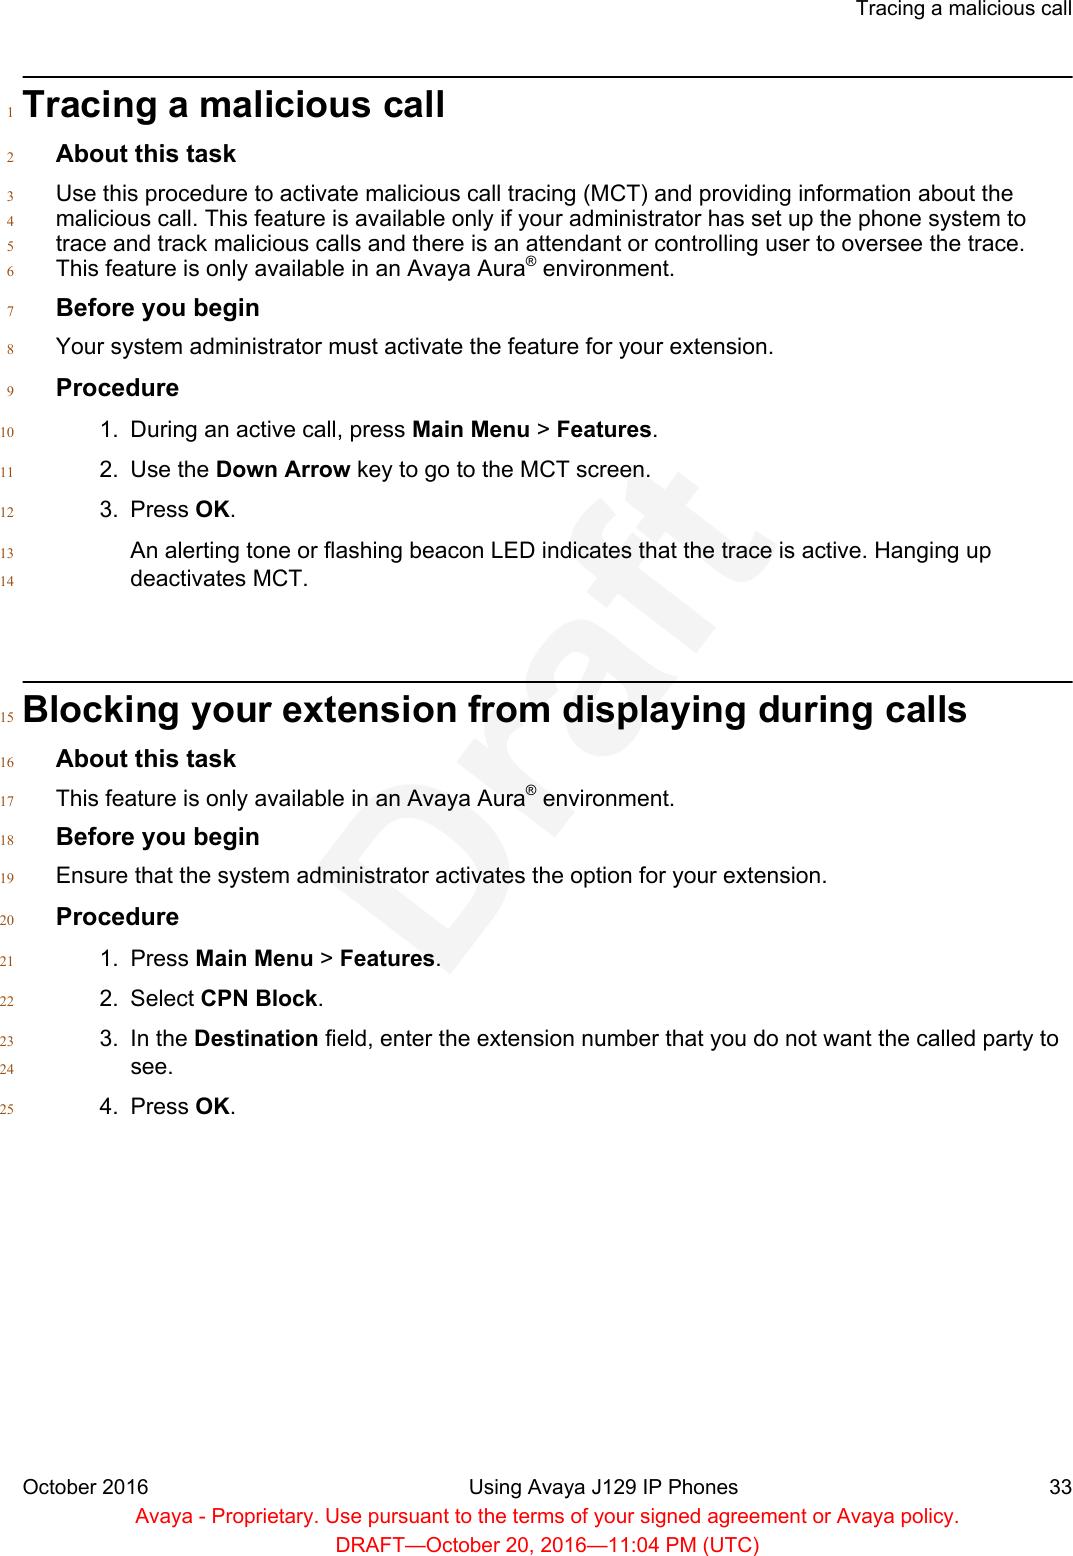 Avaya J129 J129 IP Deskphone User Manual Using Avaya J129 IP Phones